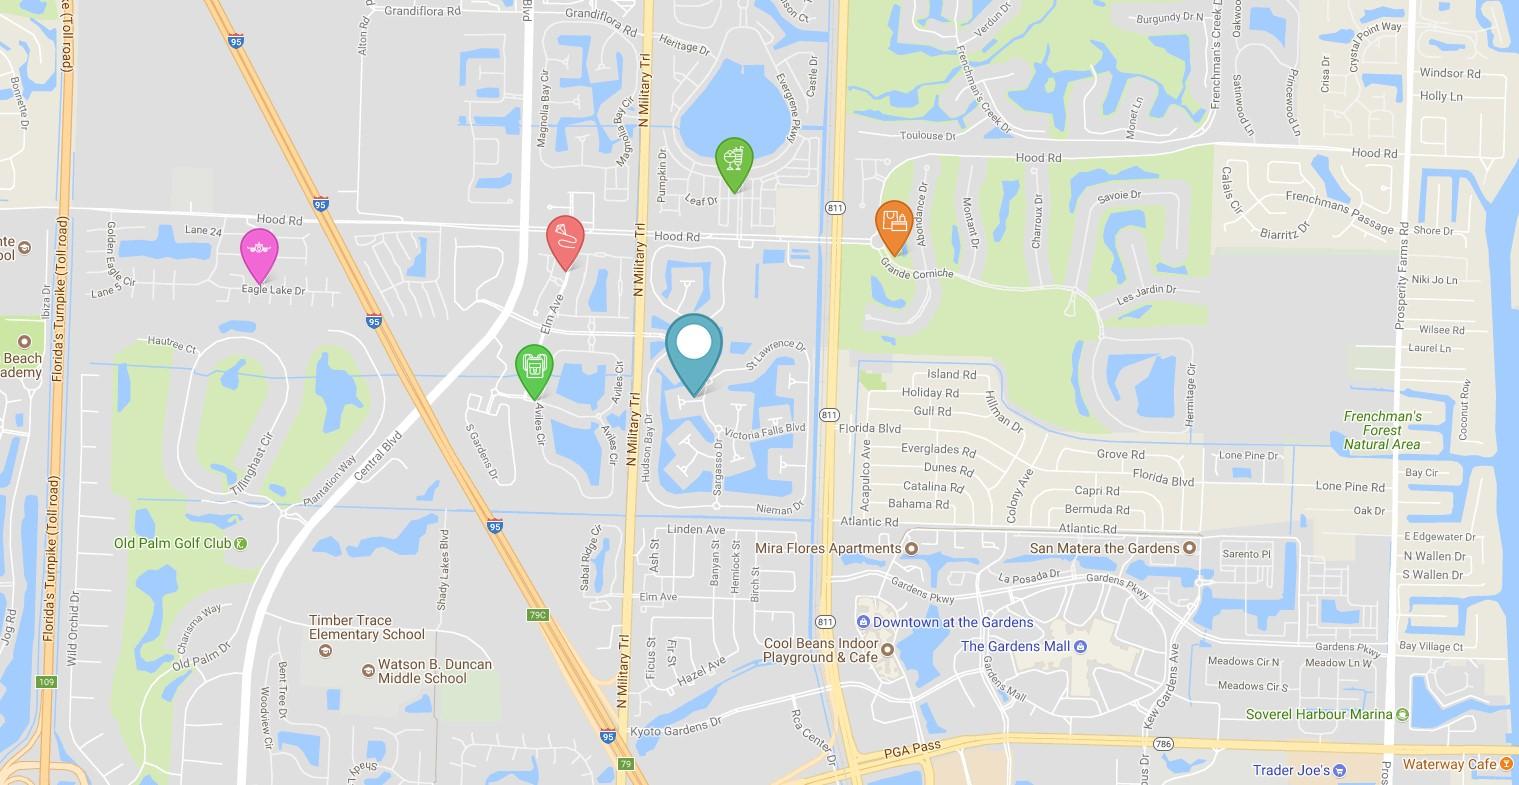 https://documentation.bold-themes.com/estato/wp-content/uploads/sites/21/2017/08/google-map-location_f.jpg